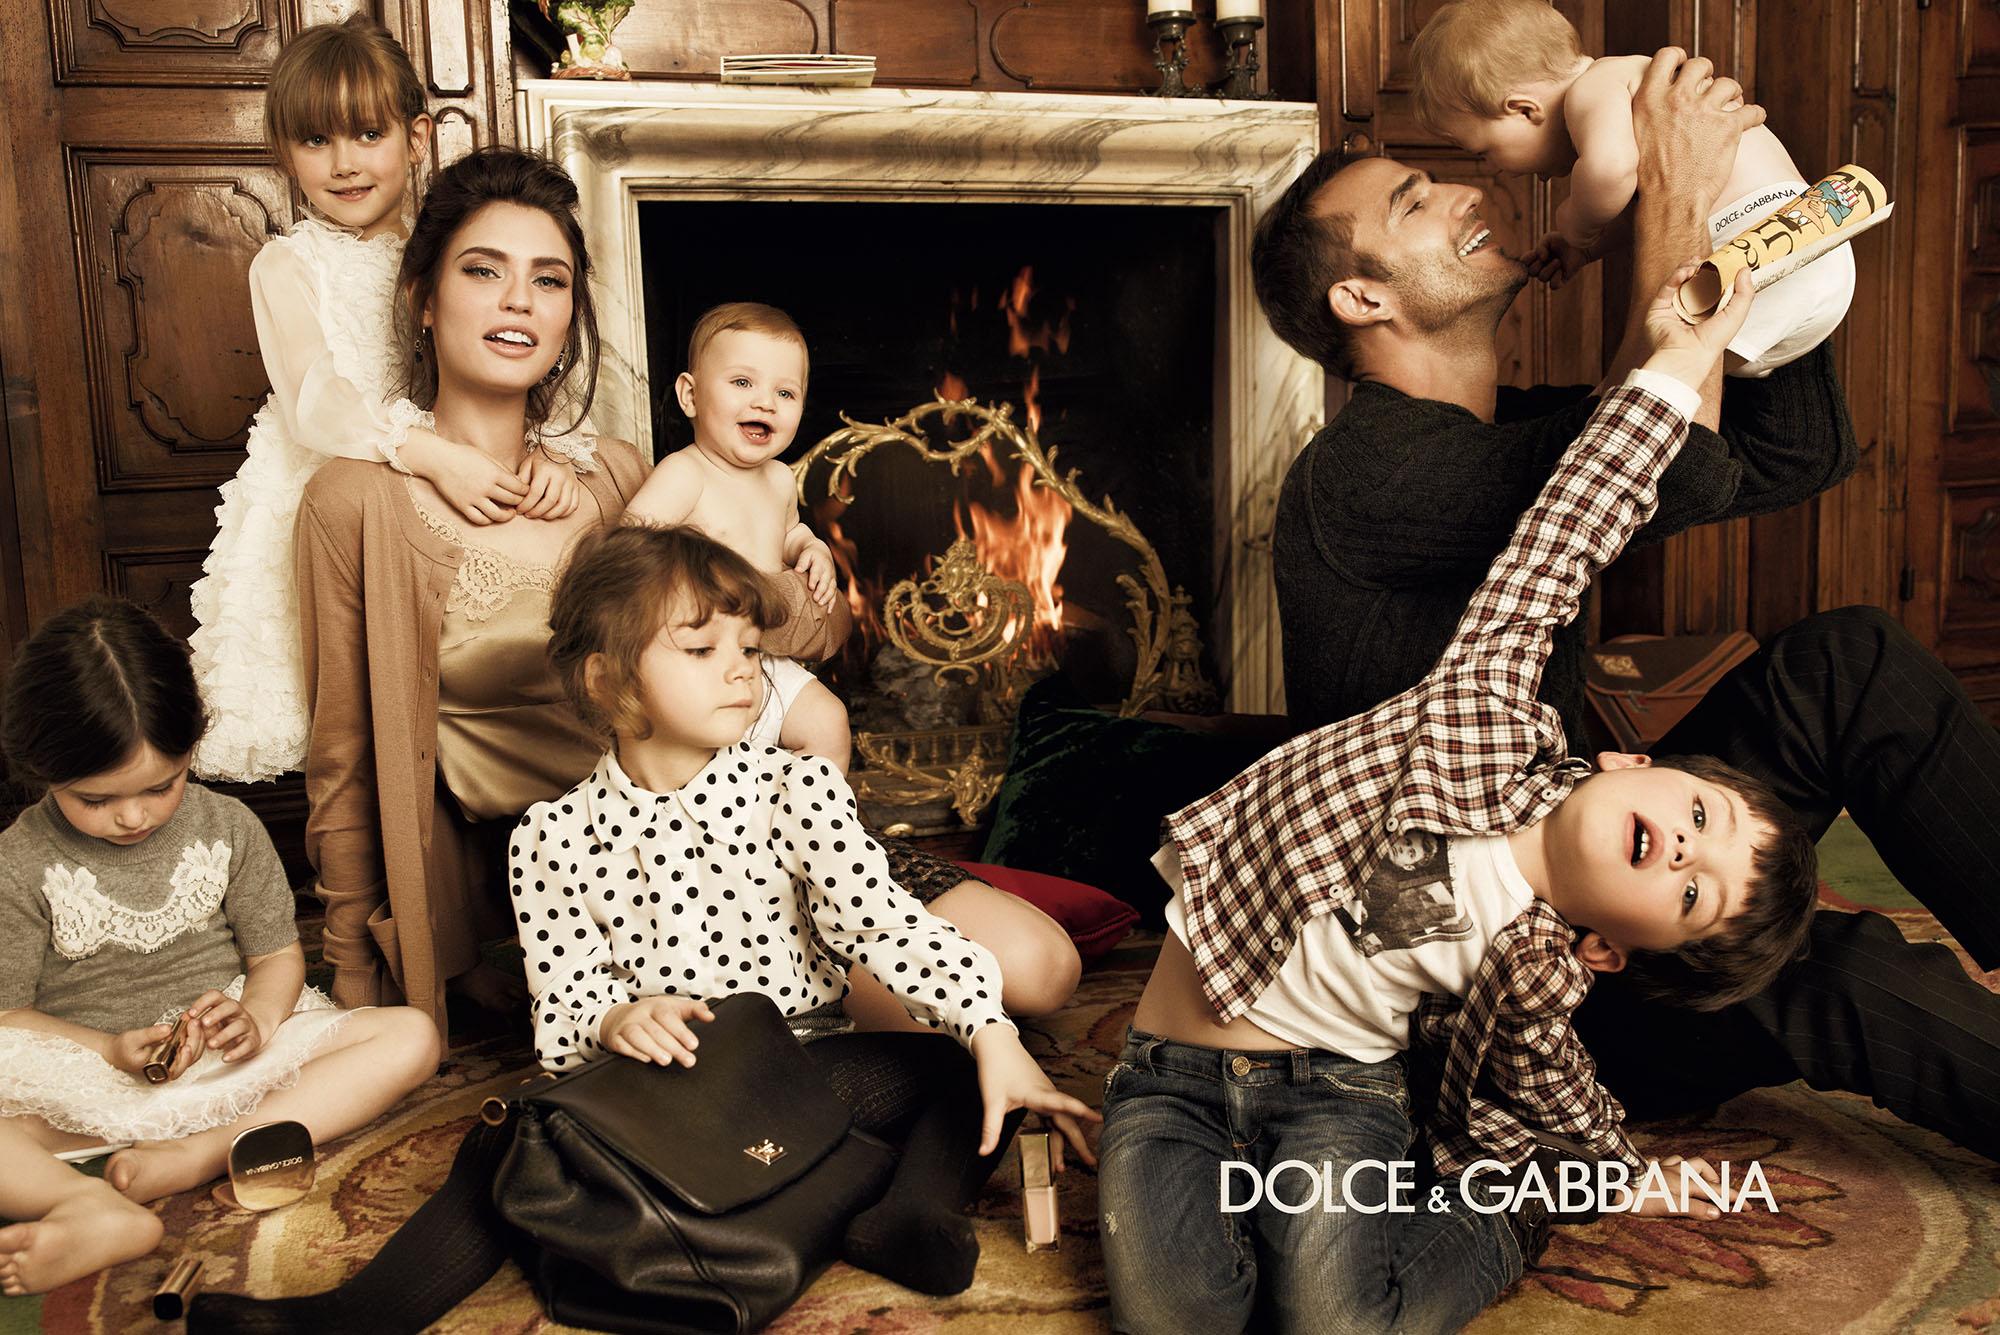 D&G children's collection